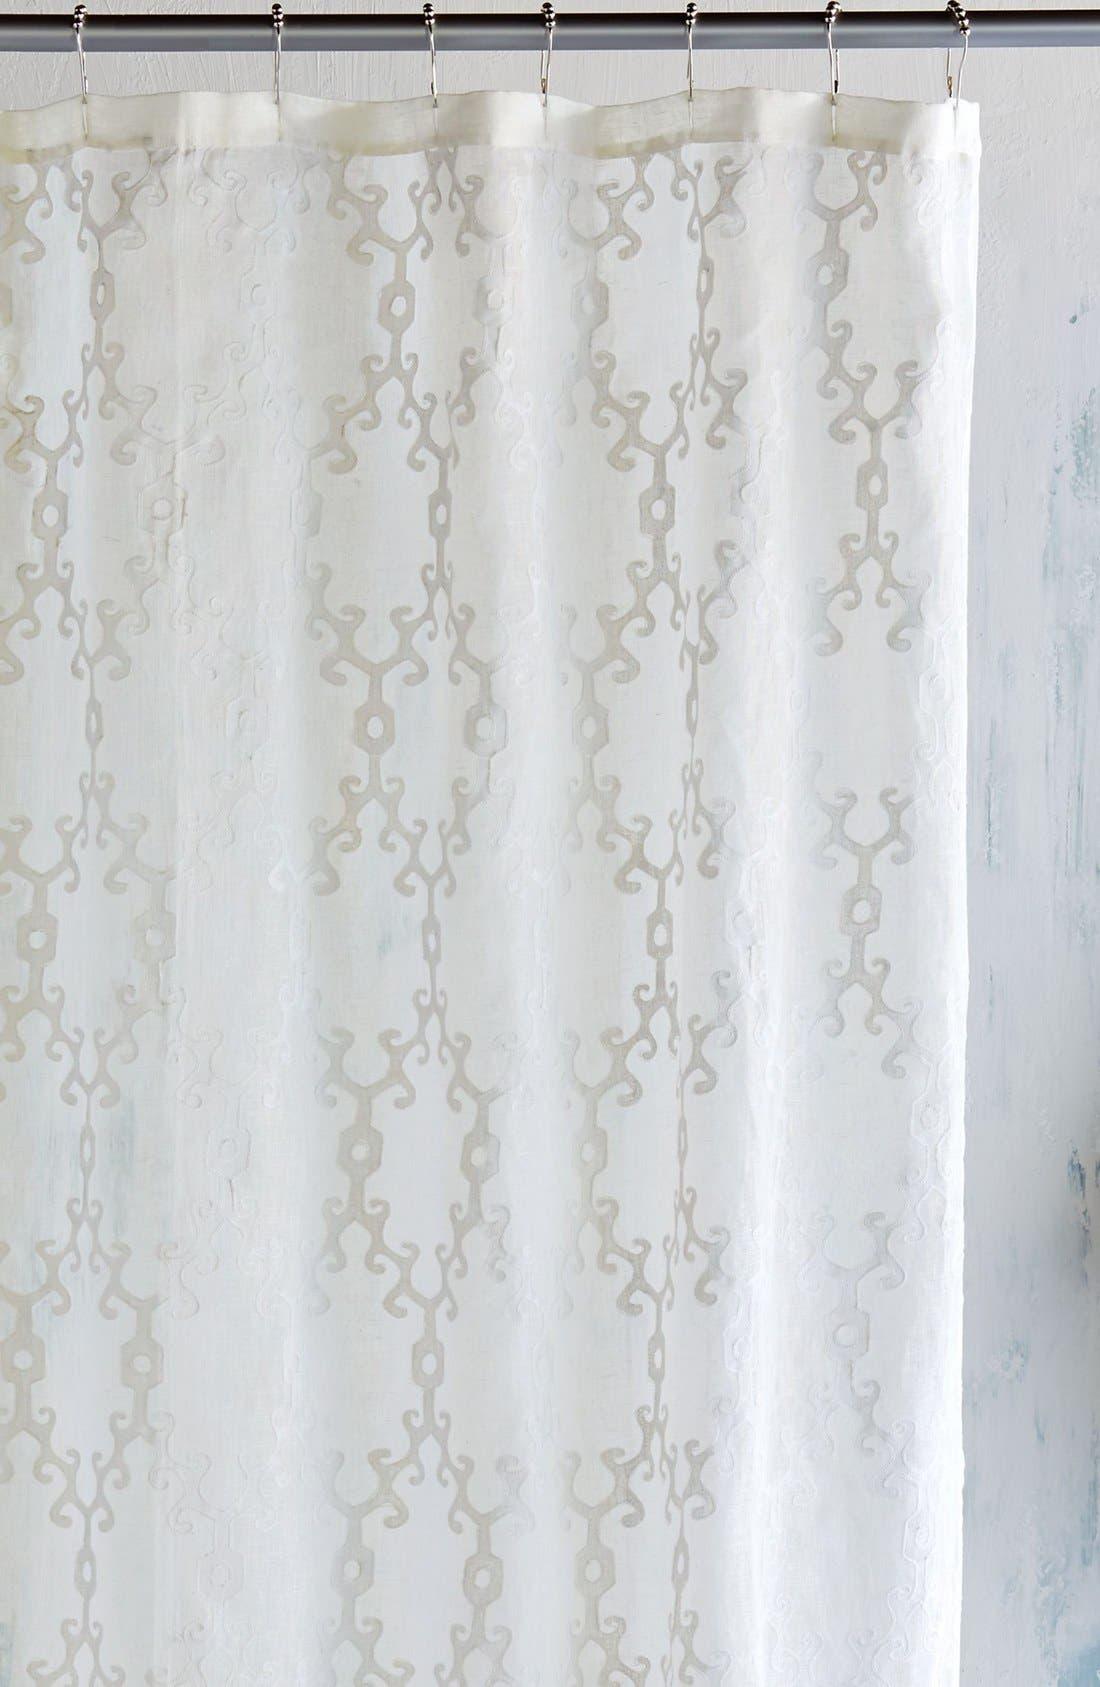 'Totem' Shower Curtain,                             Main thumbnail 1, color,                             100